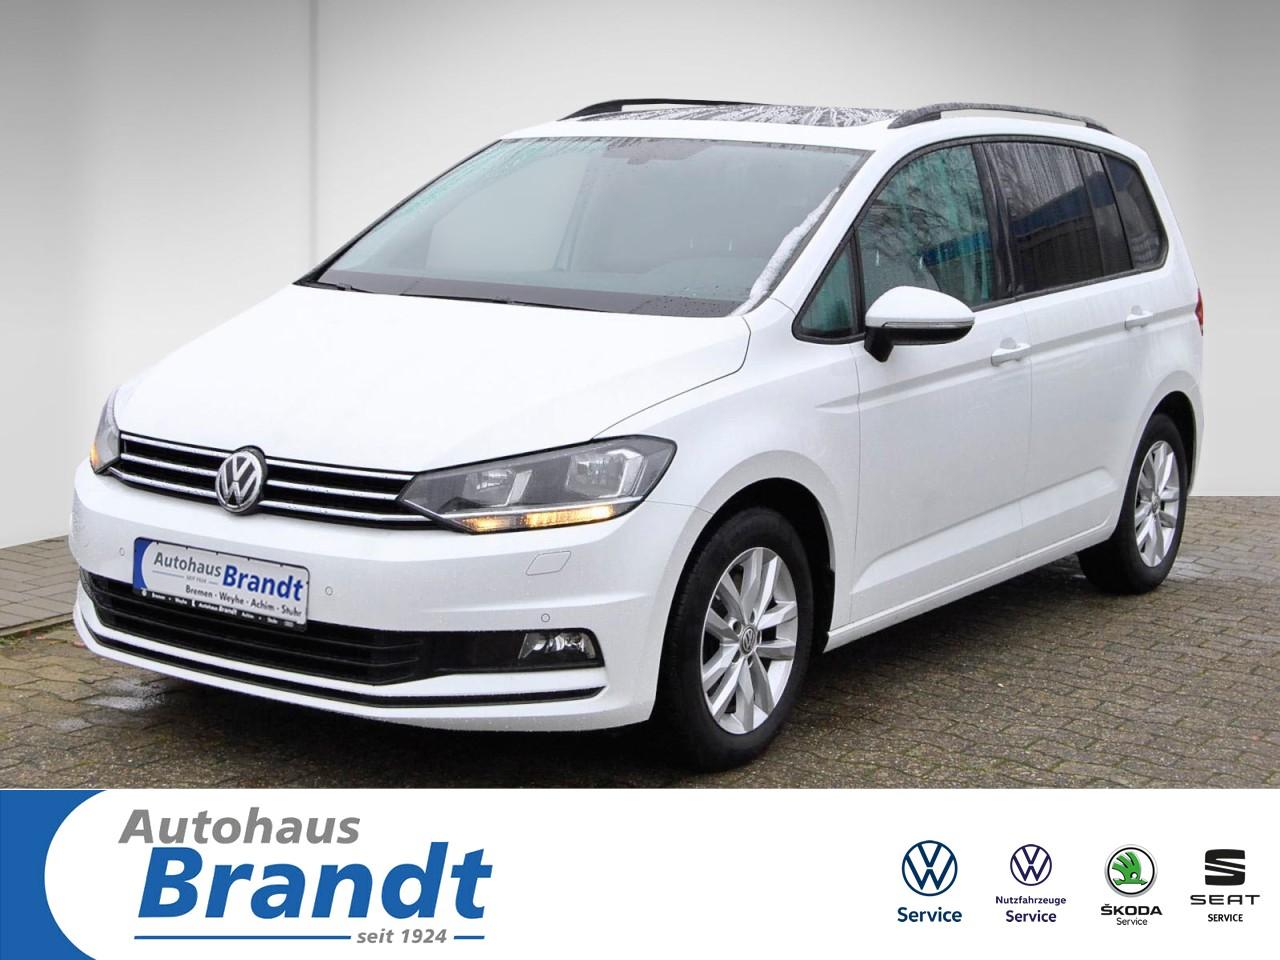 Volkswagen Touran 1.6 TDI Comfortline NAVI*PANO*7-SITZER*AHK, Jahr 2017, Diesel